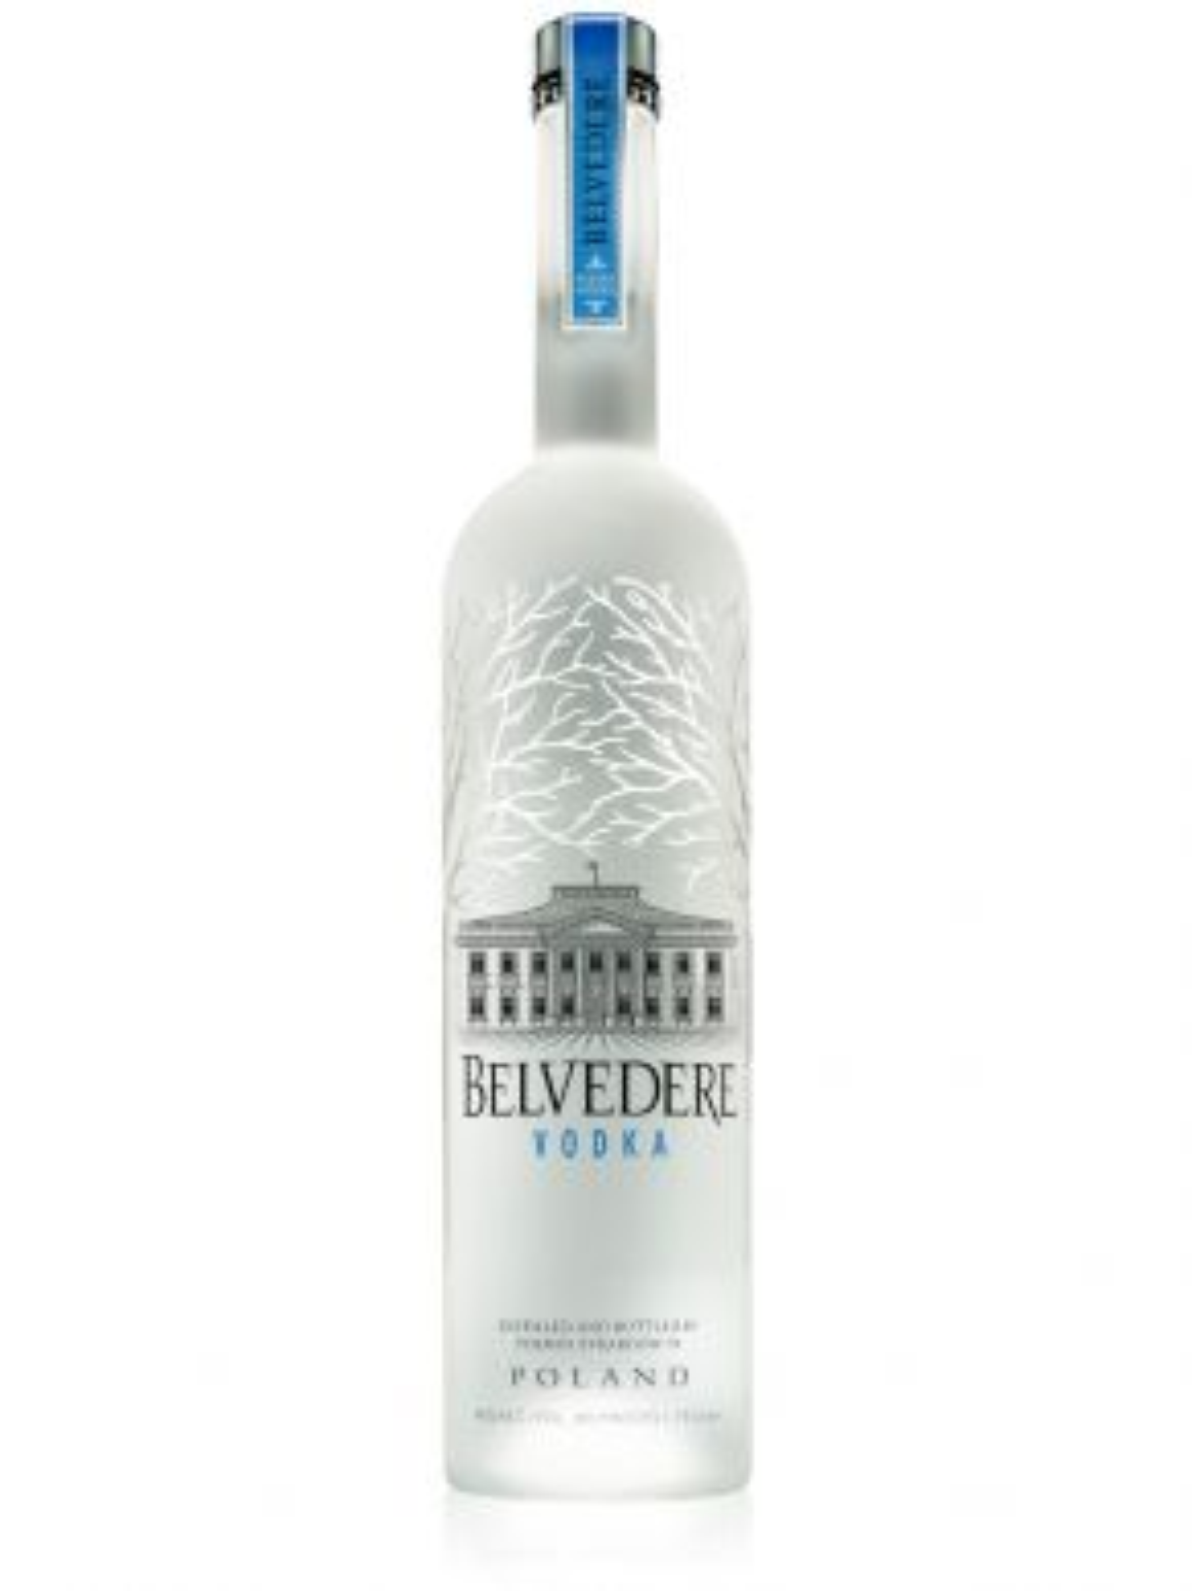 Belvedere Vodka Pure Polish Vodka Magnum 175cl